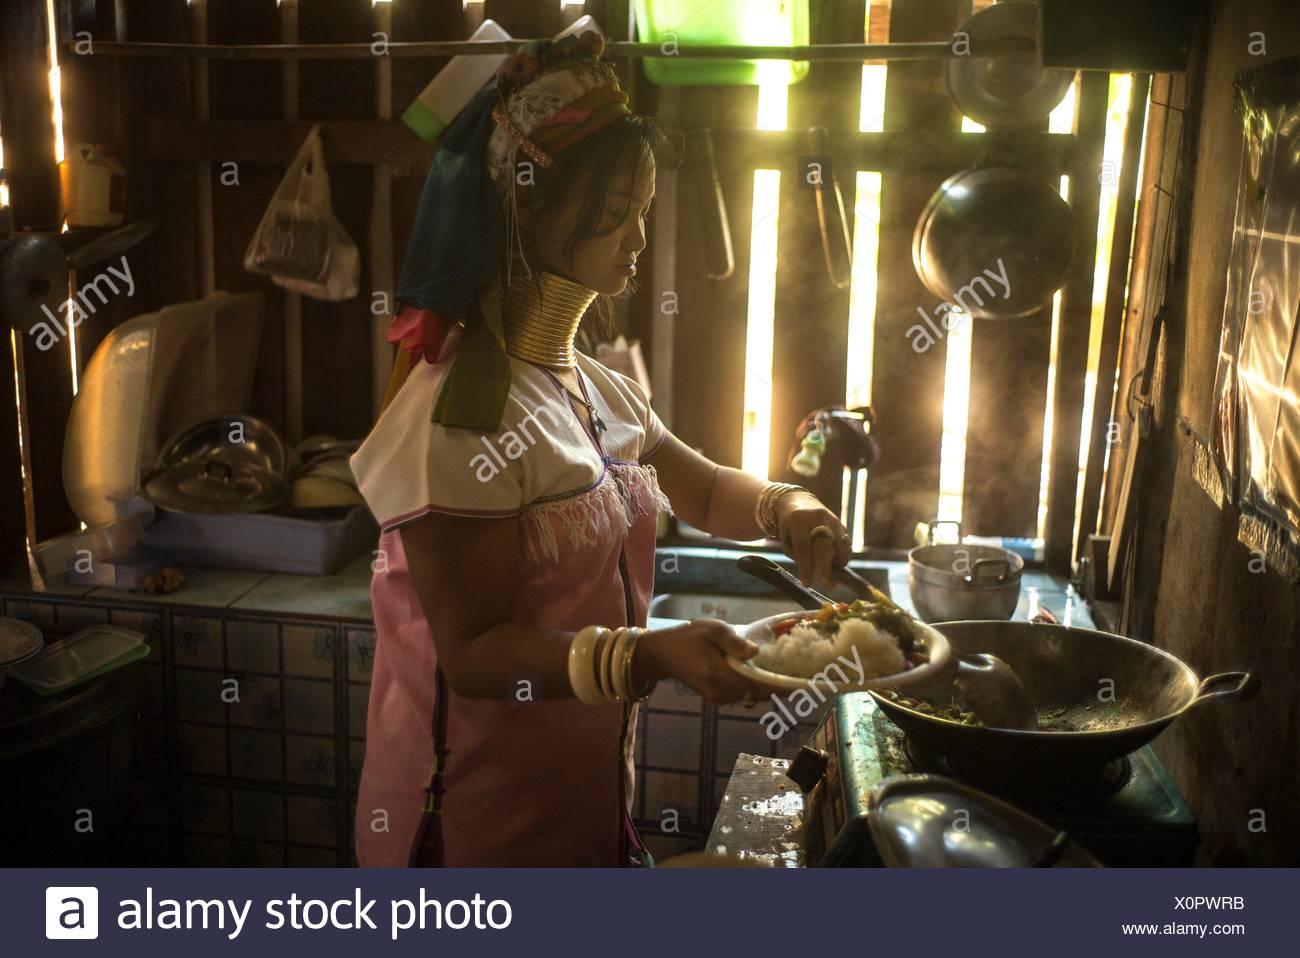 A Karenni woman serves breakfast in her kitchen. - Stock Image